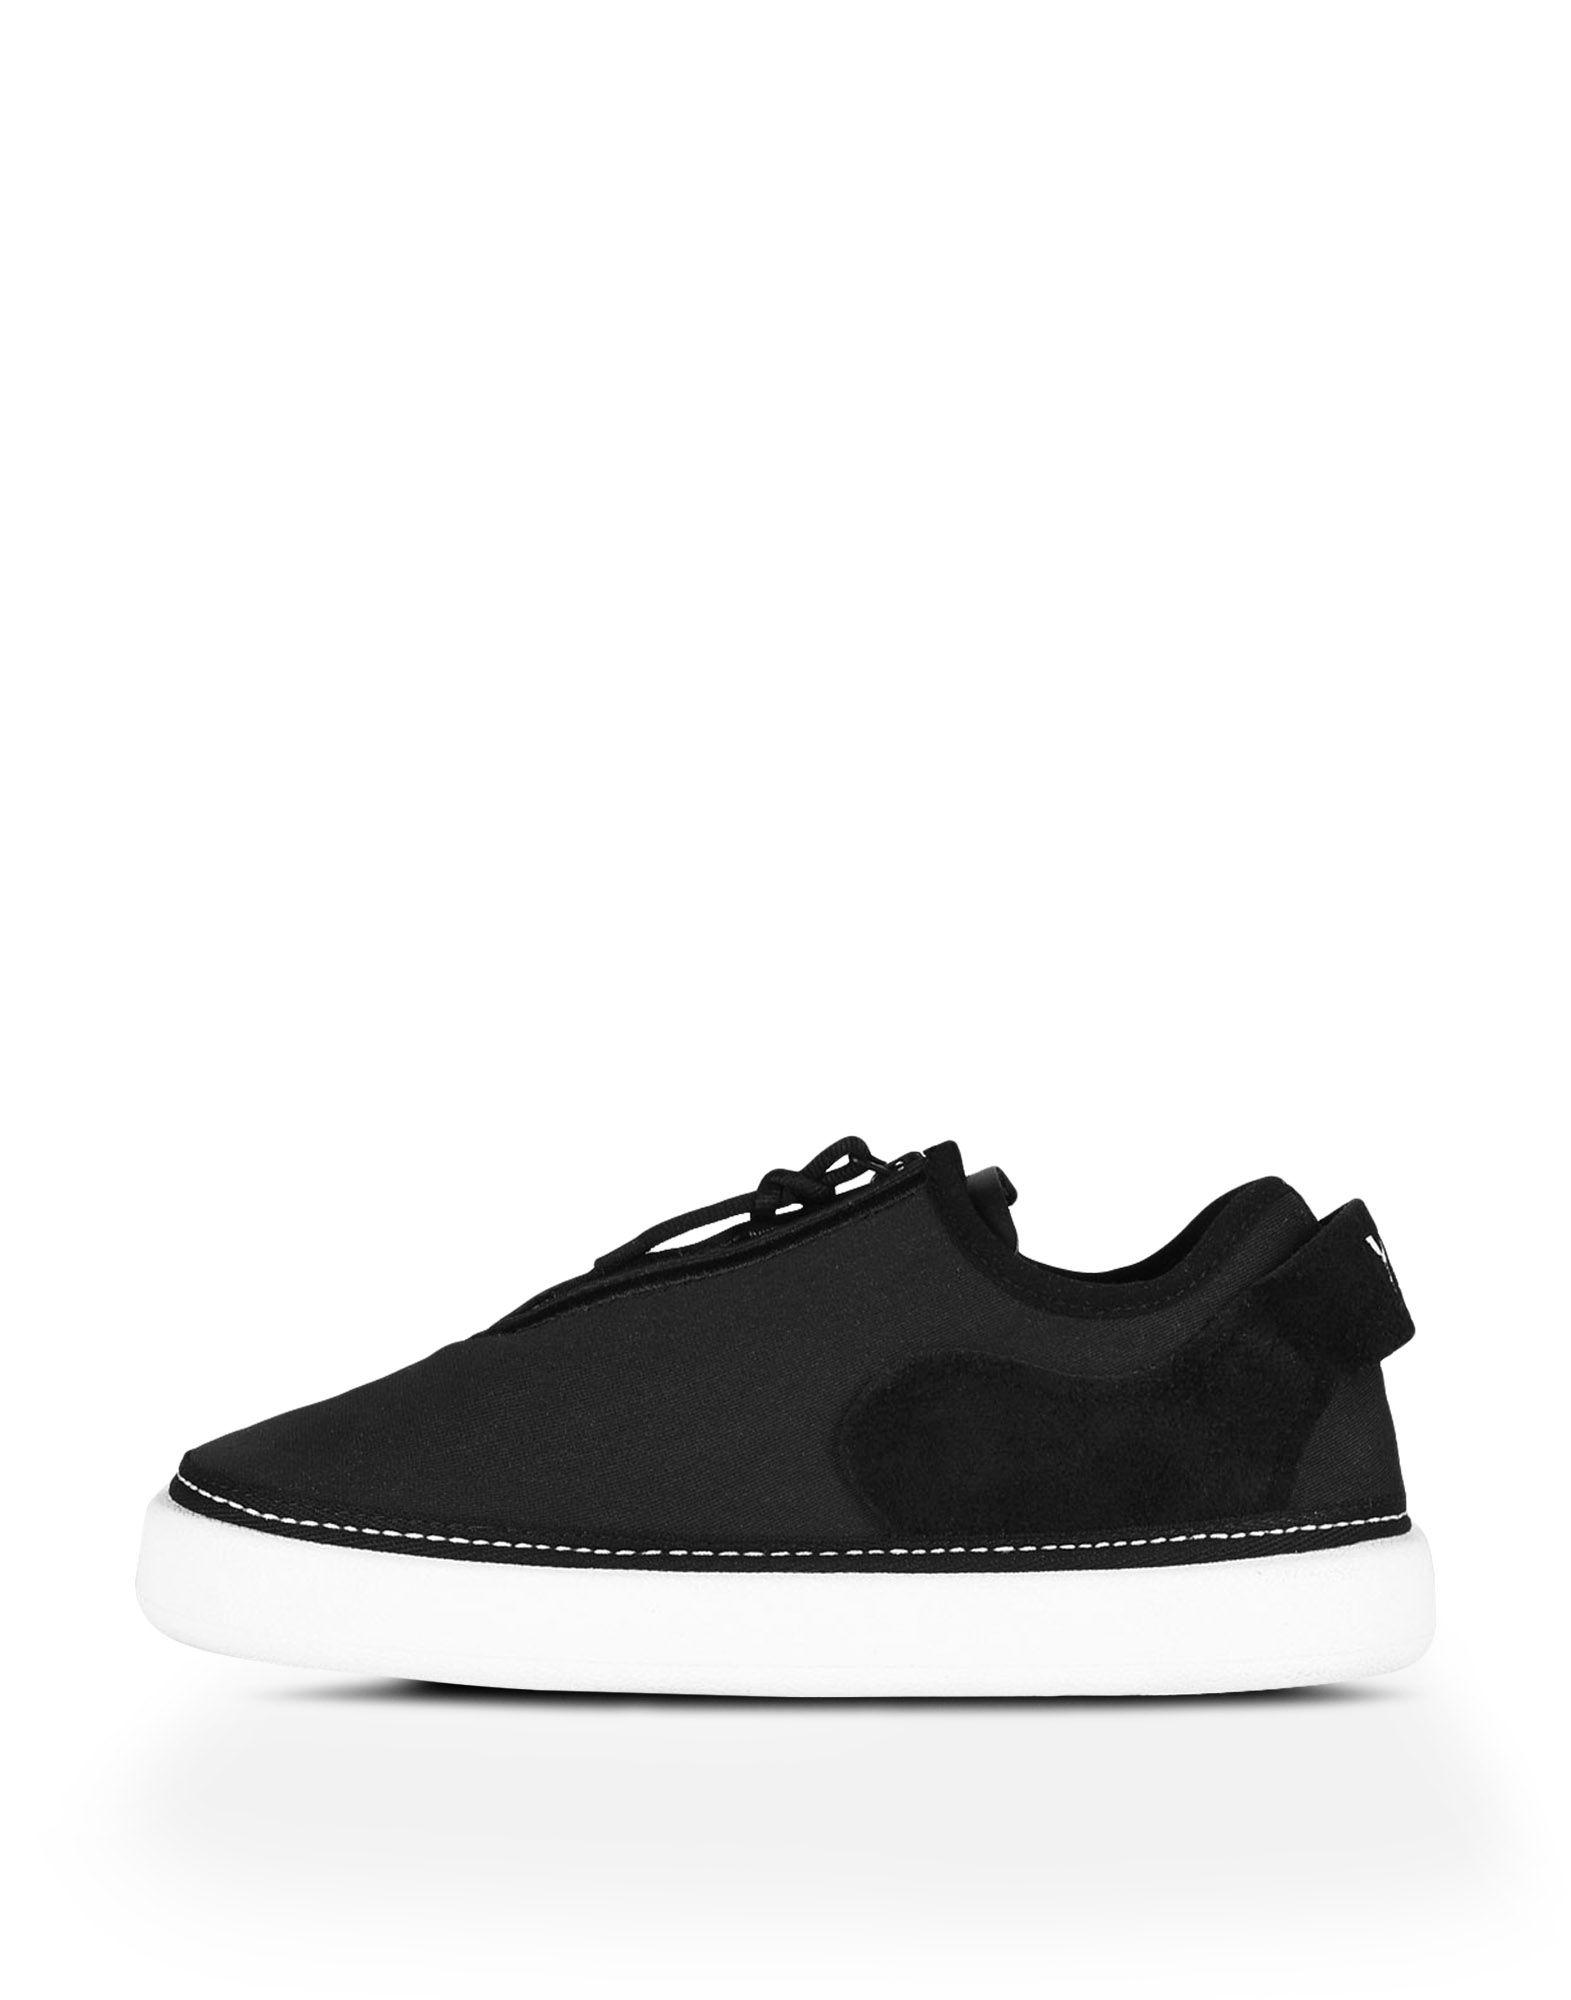 Y-3 Designer Shoes, Comfort Zip Stretch Mesh and Suede Women's Sneakers